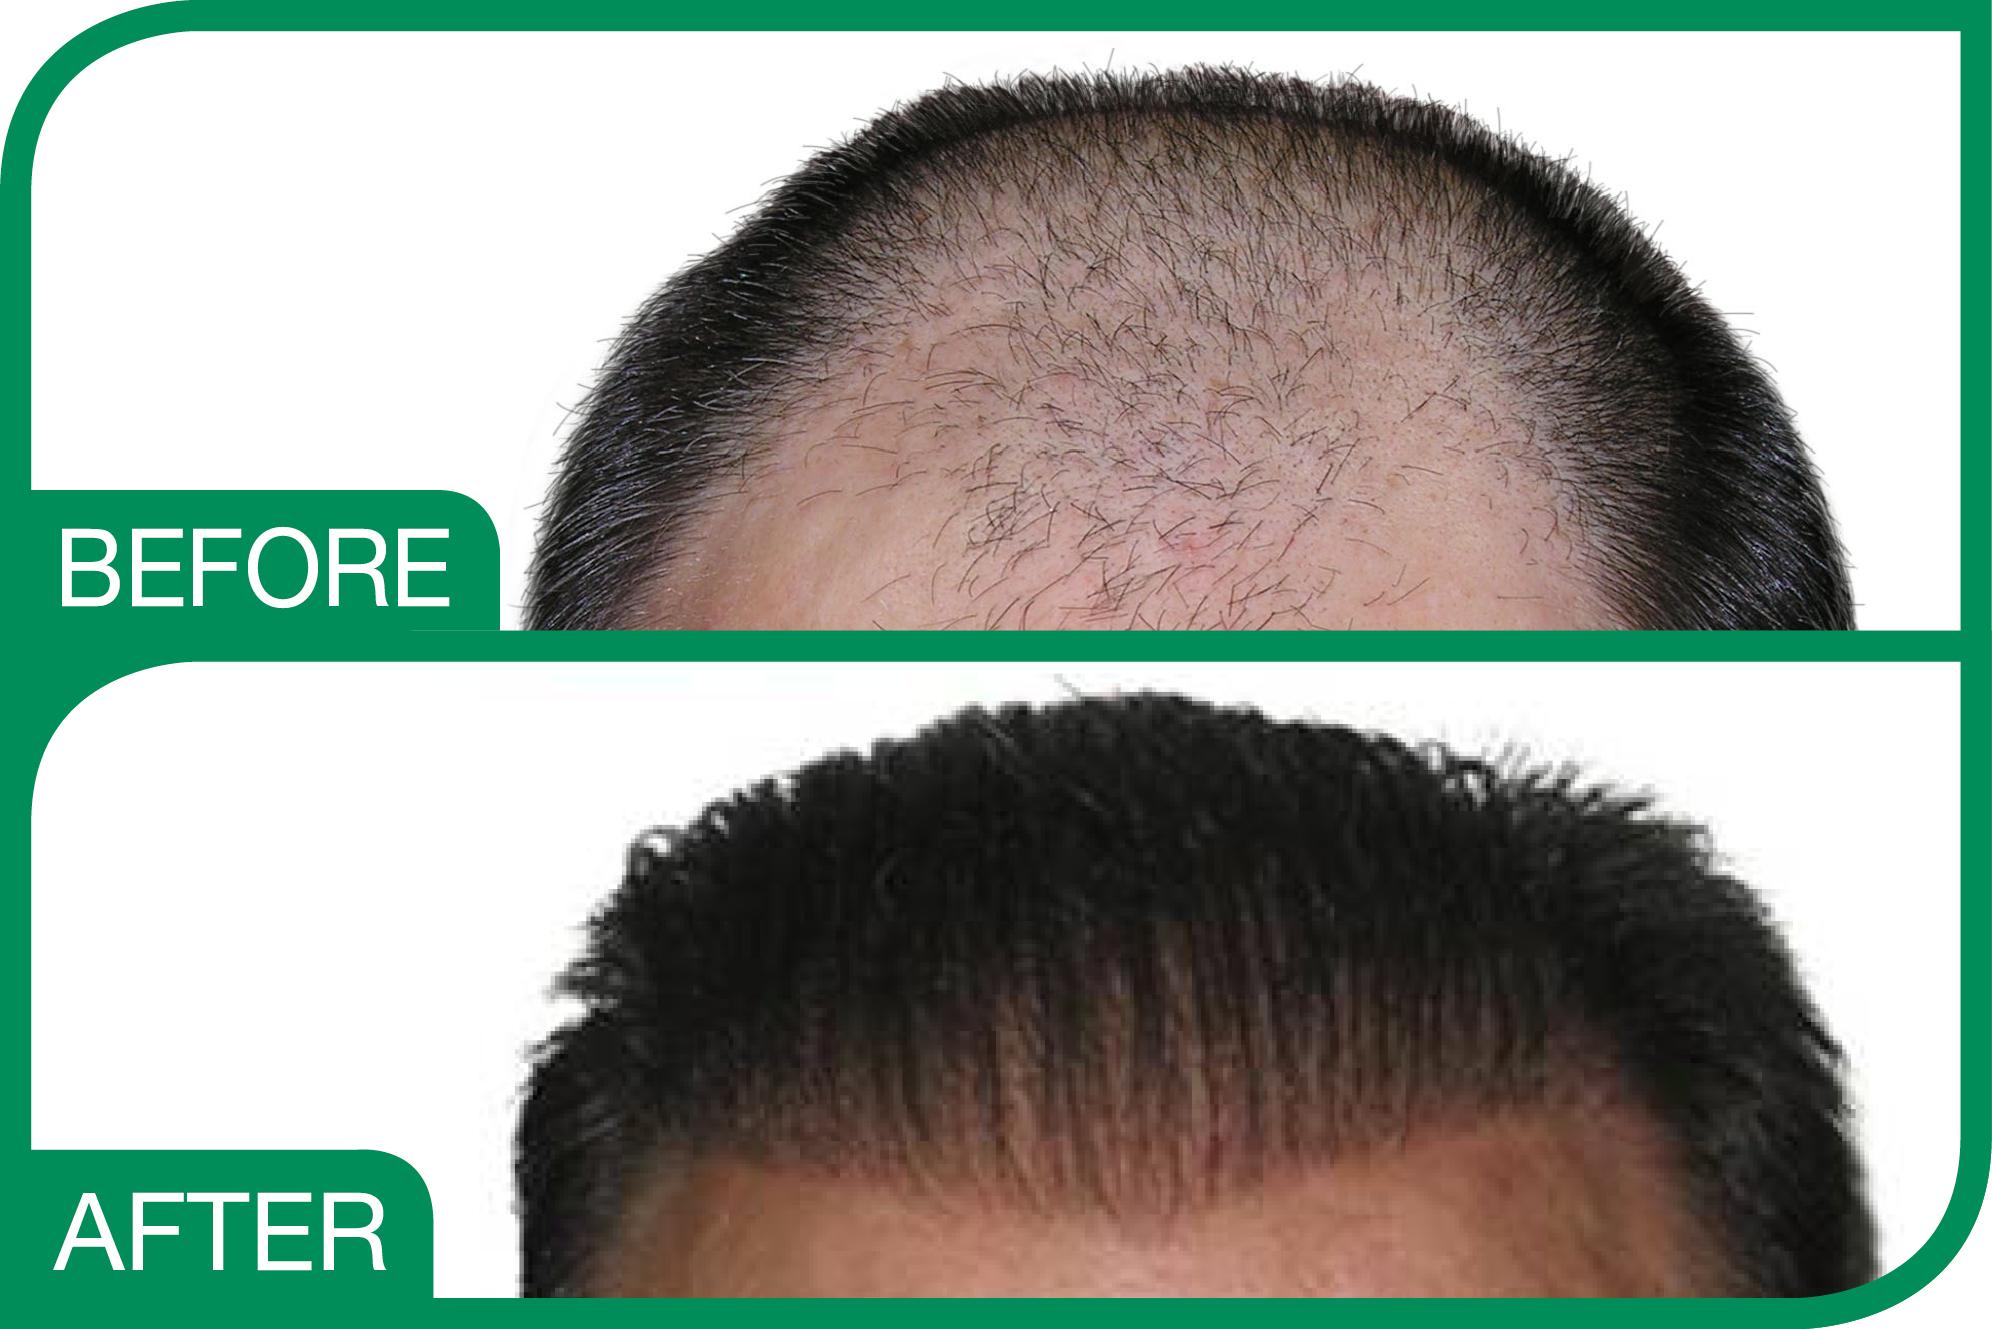 Hair Implant Sure Baldness Solution Medicap